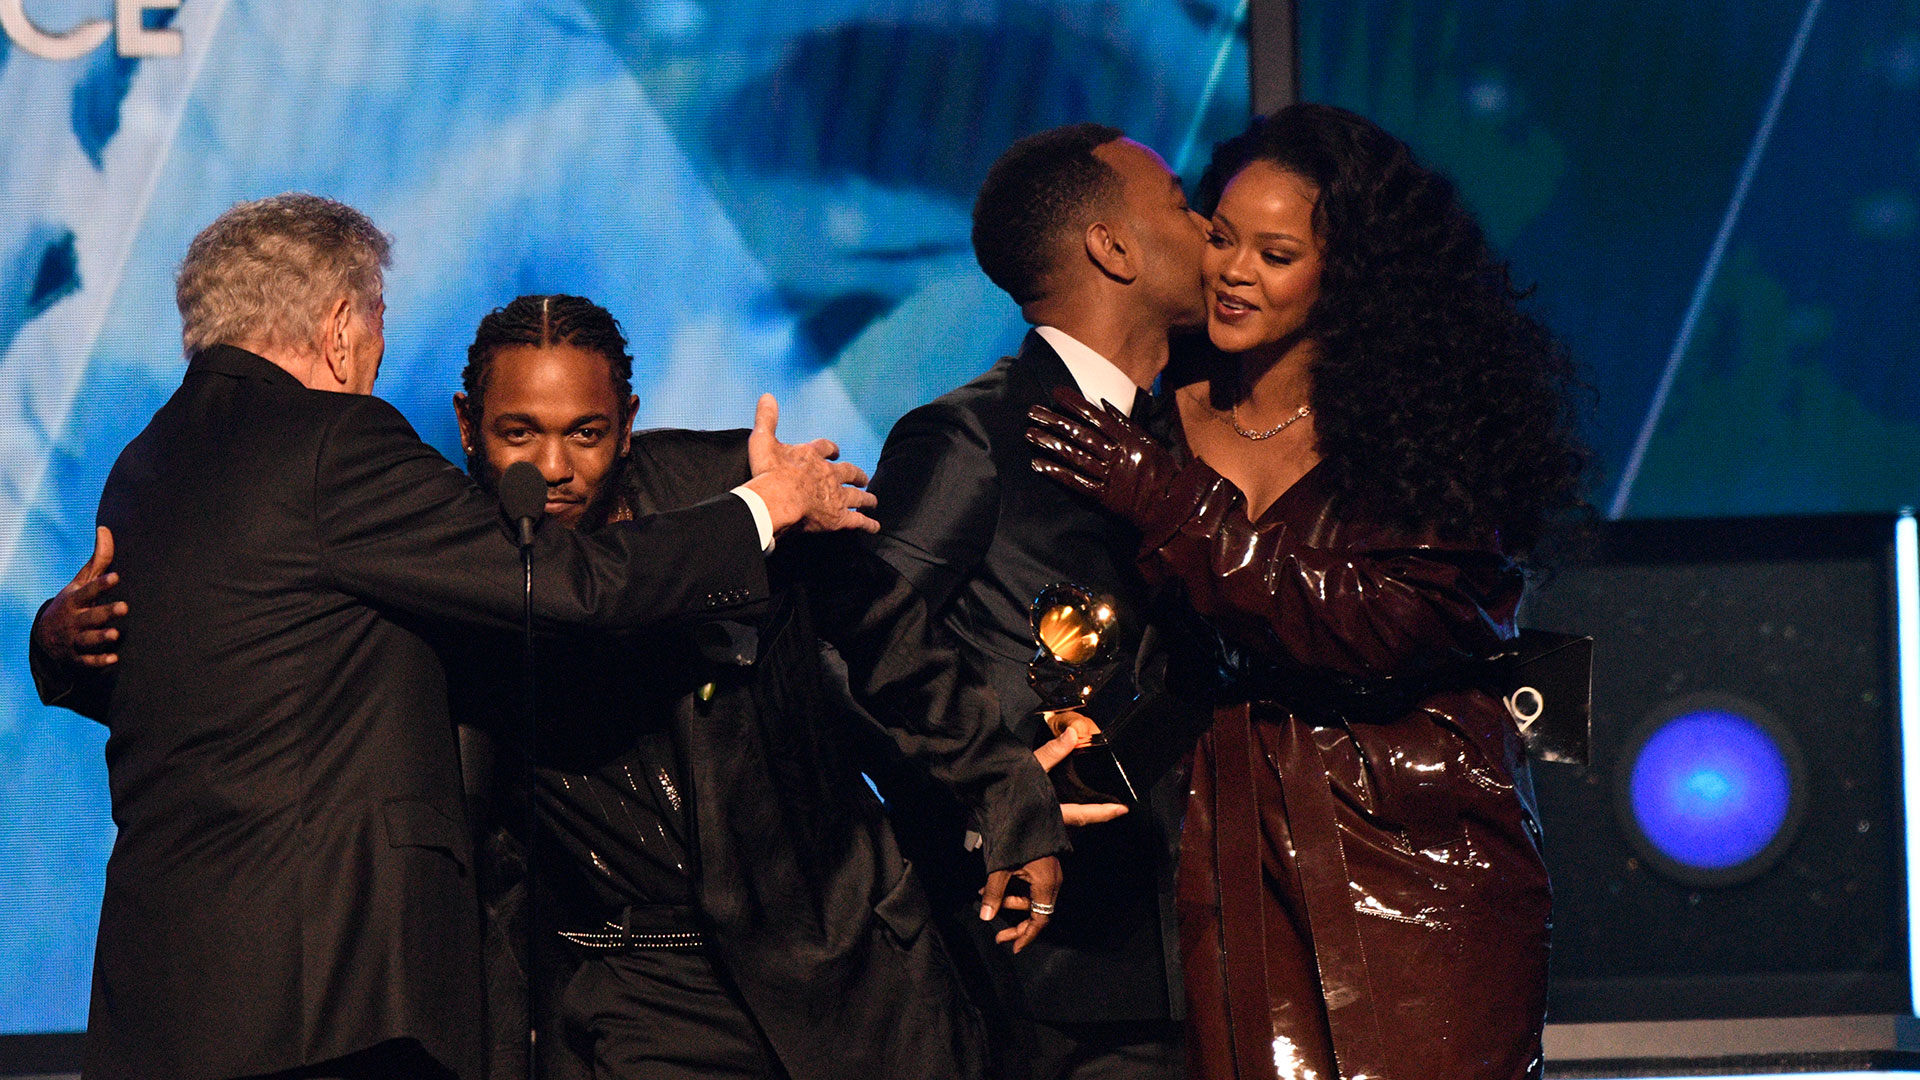 Kendrick Lamar wins Best Rap/Sung Performance for